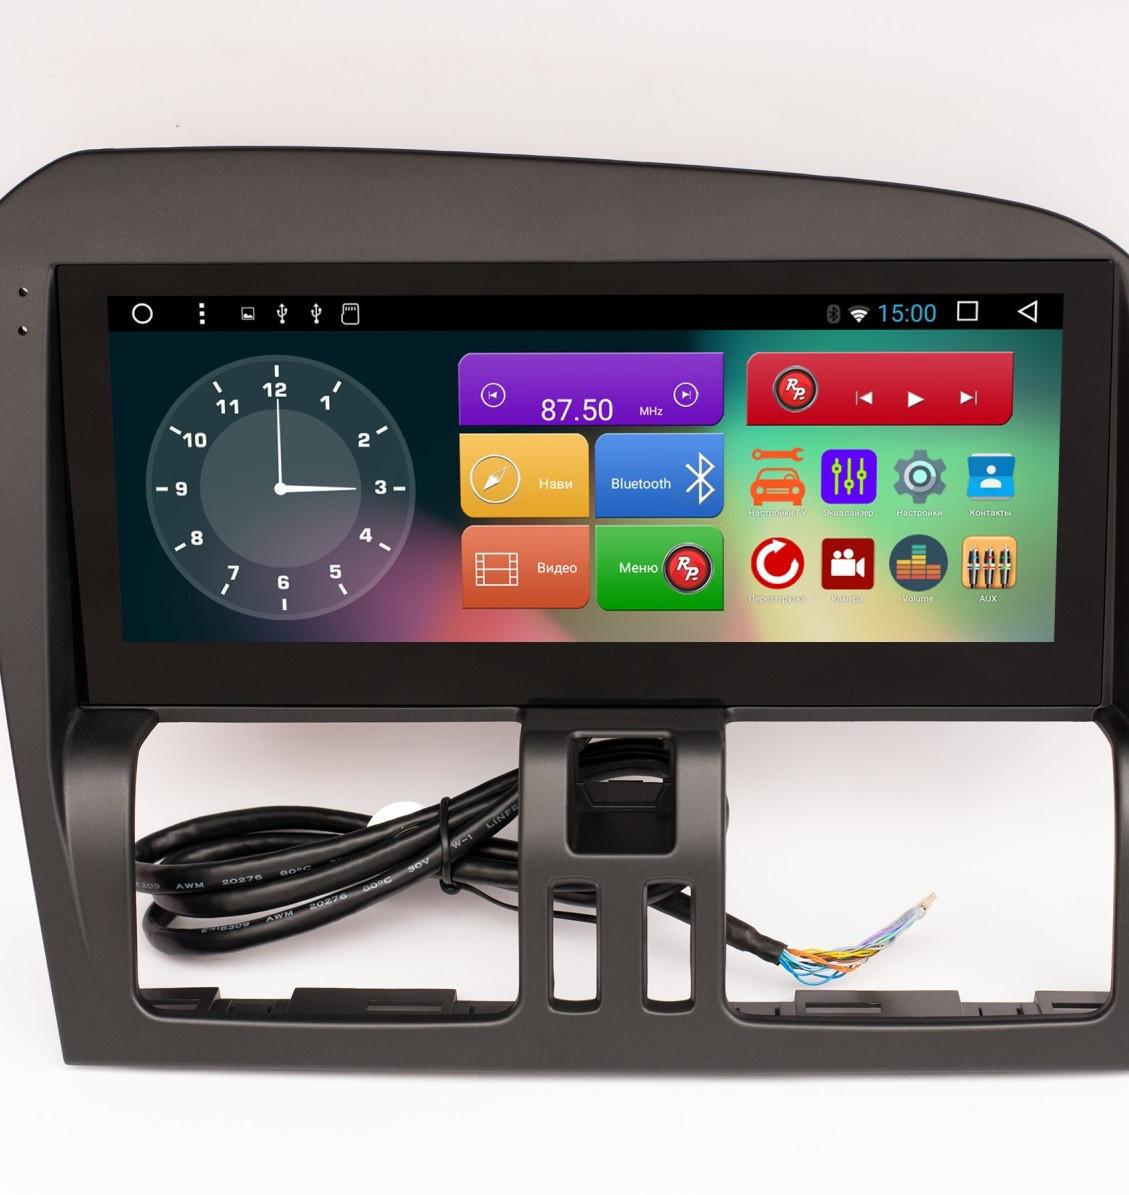 Штатная автомагнитола для Volvo XC60 на android 6.0.1 RedPower 31160 IPS